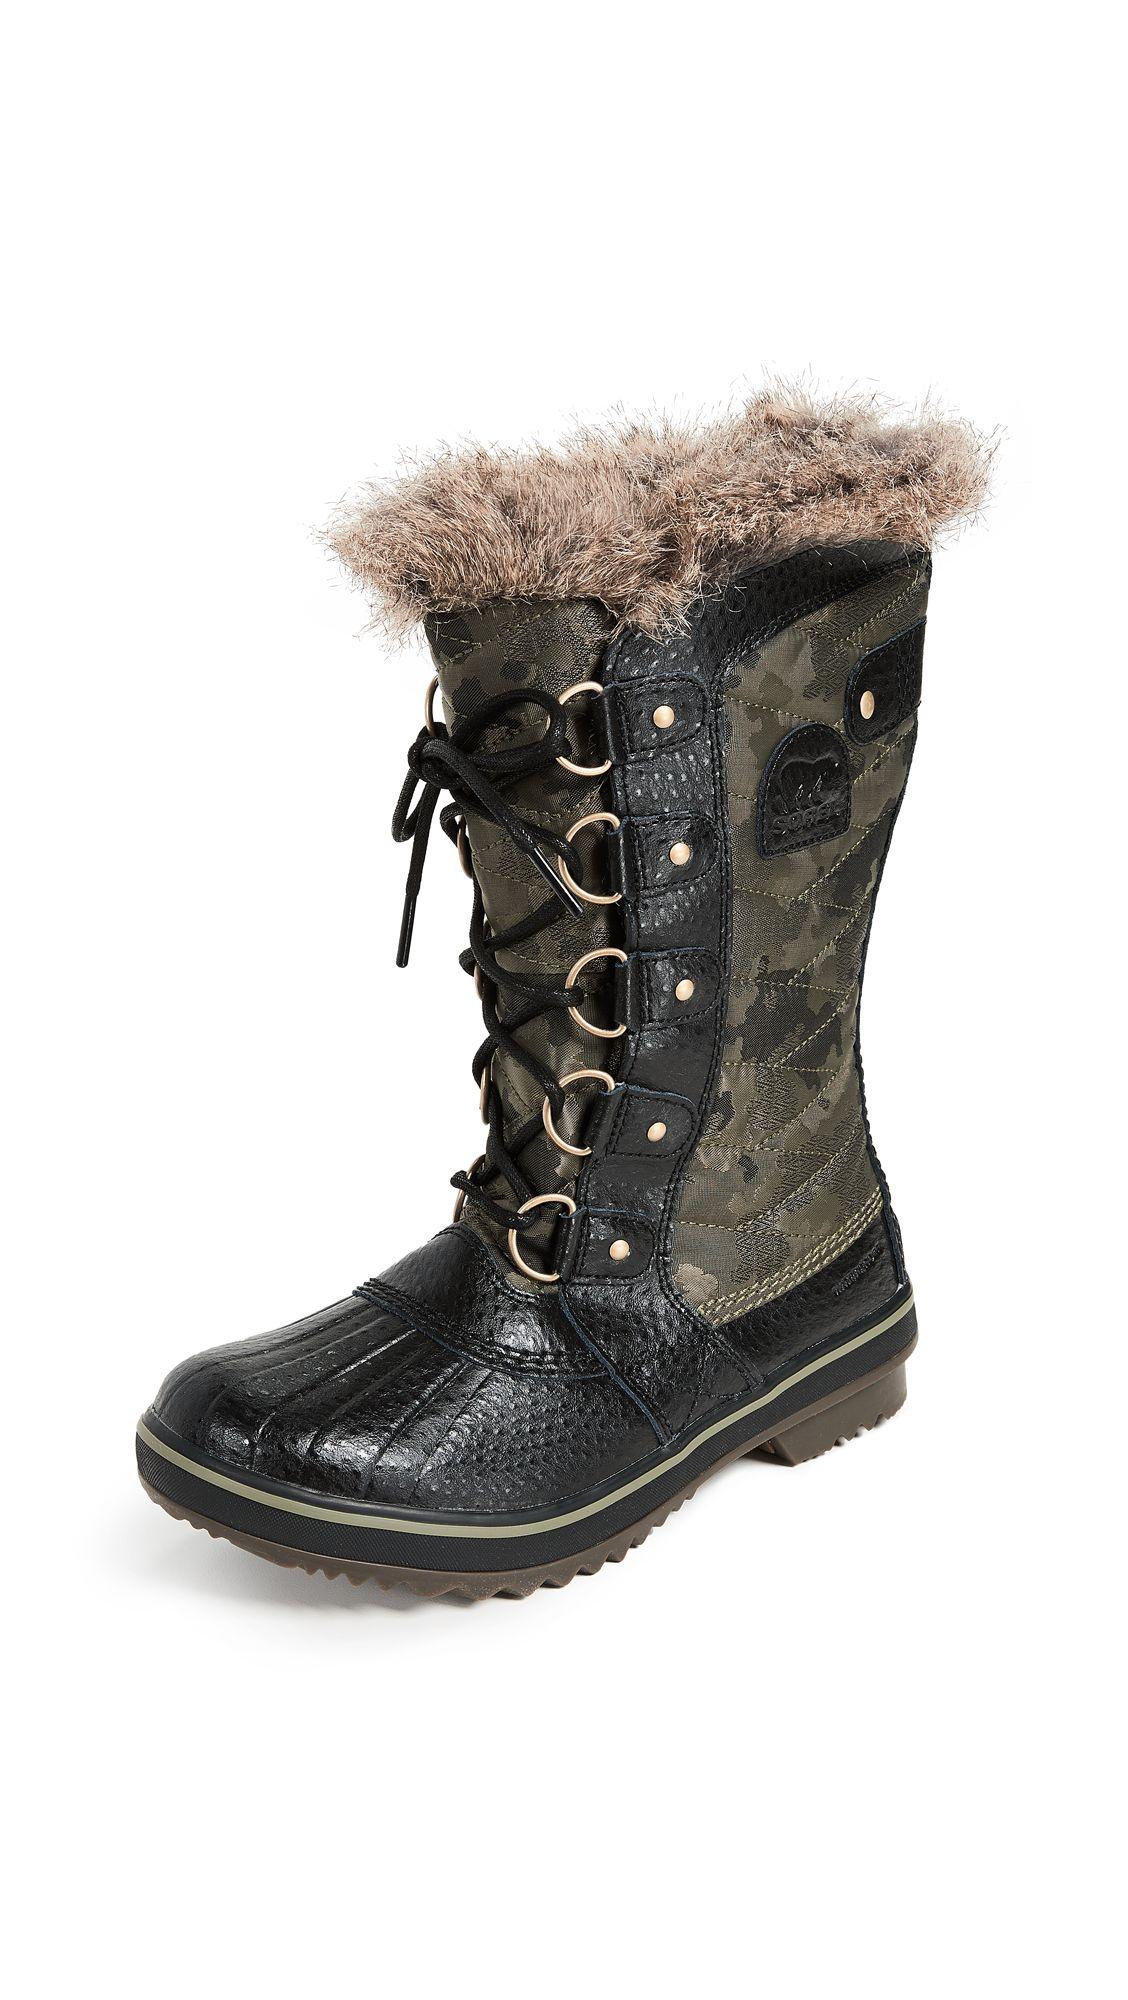 14ff82591d9c5 Tofino II Boots, #Camo/HikerGreen #Nylon/Leather/Fur #Sorel #TofinoIIBoots